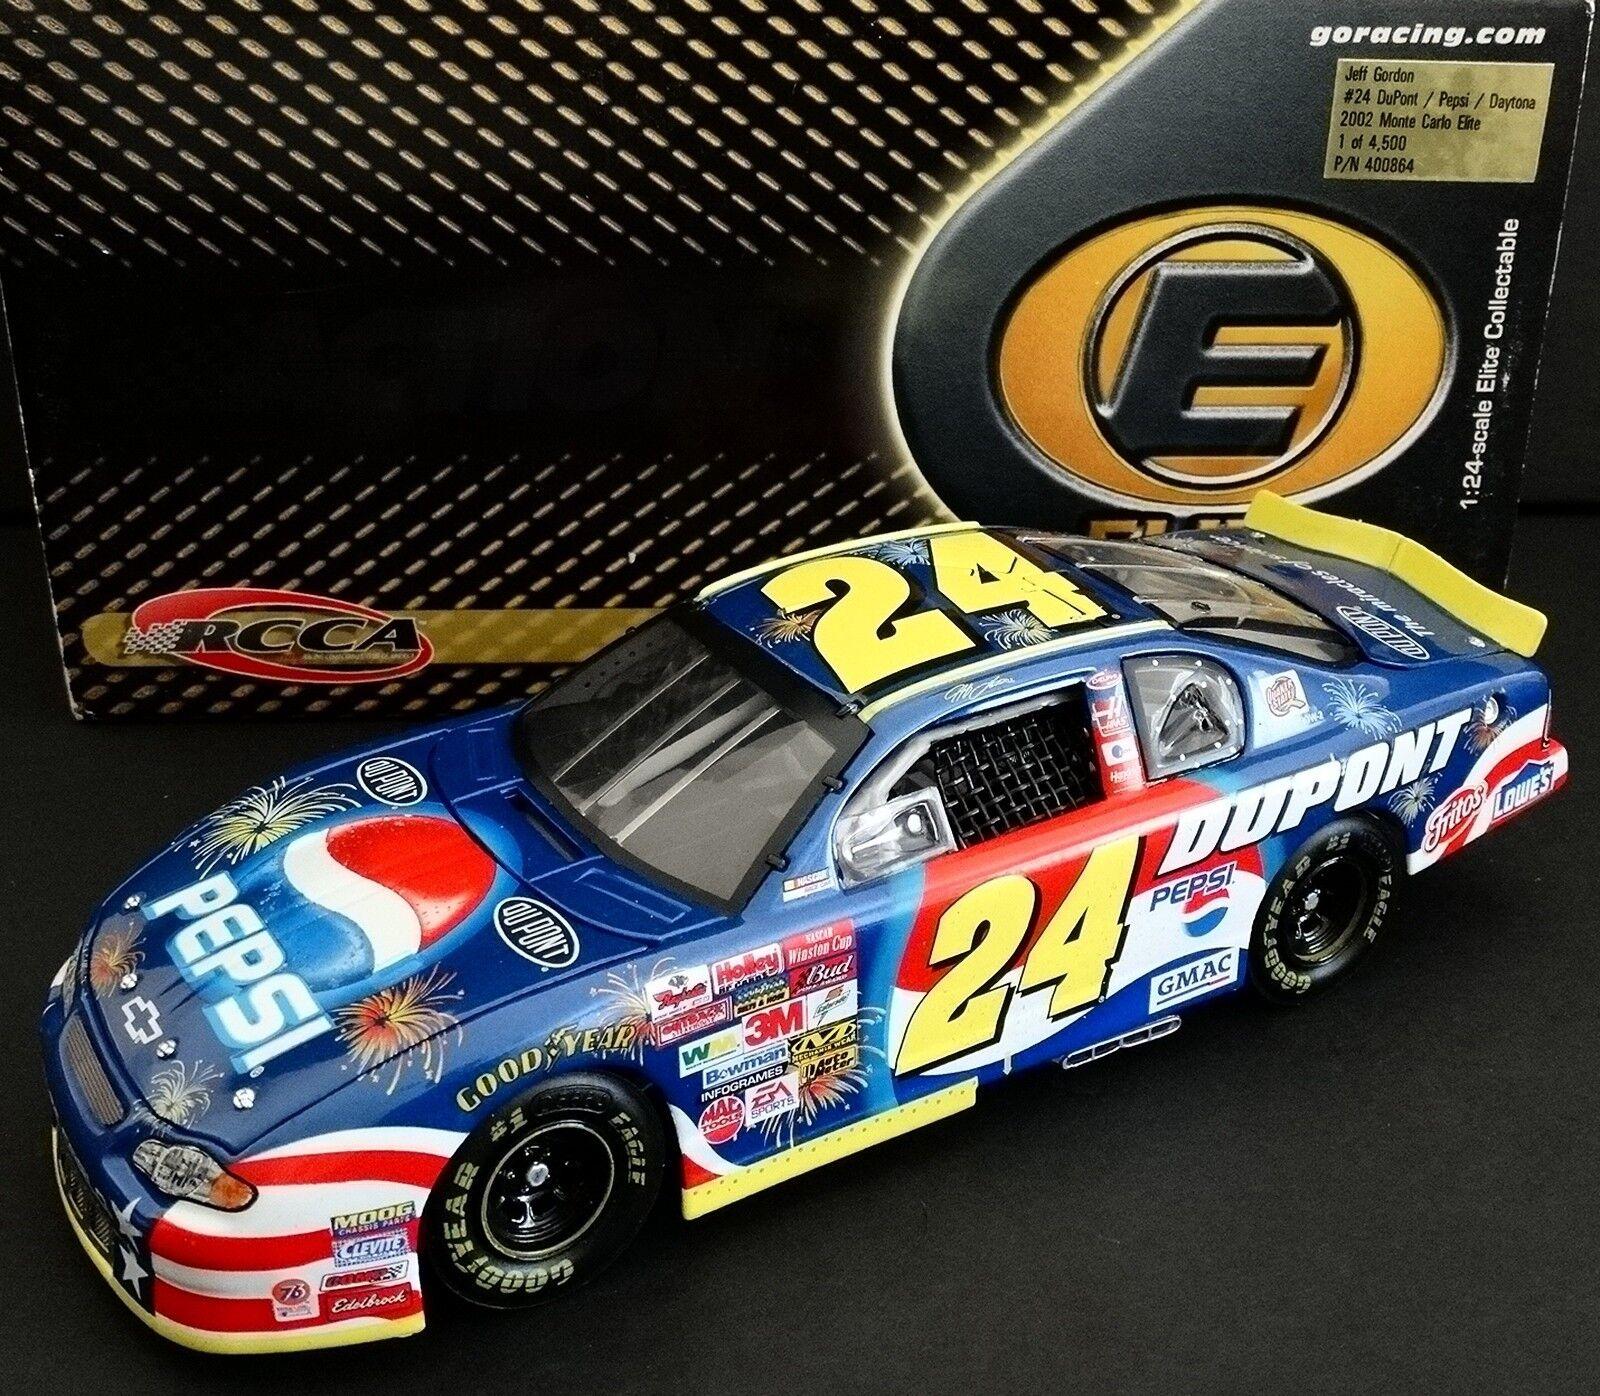 Jeff Gordon  24 Dupont  Pepsi 1 24 Elite 2002 Daytona Monte Carlo 878 4500